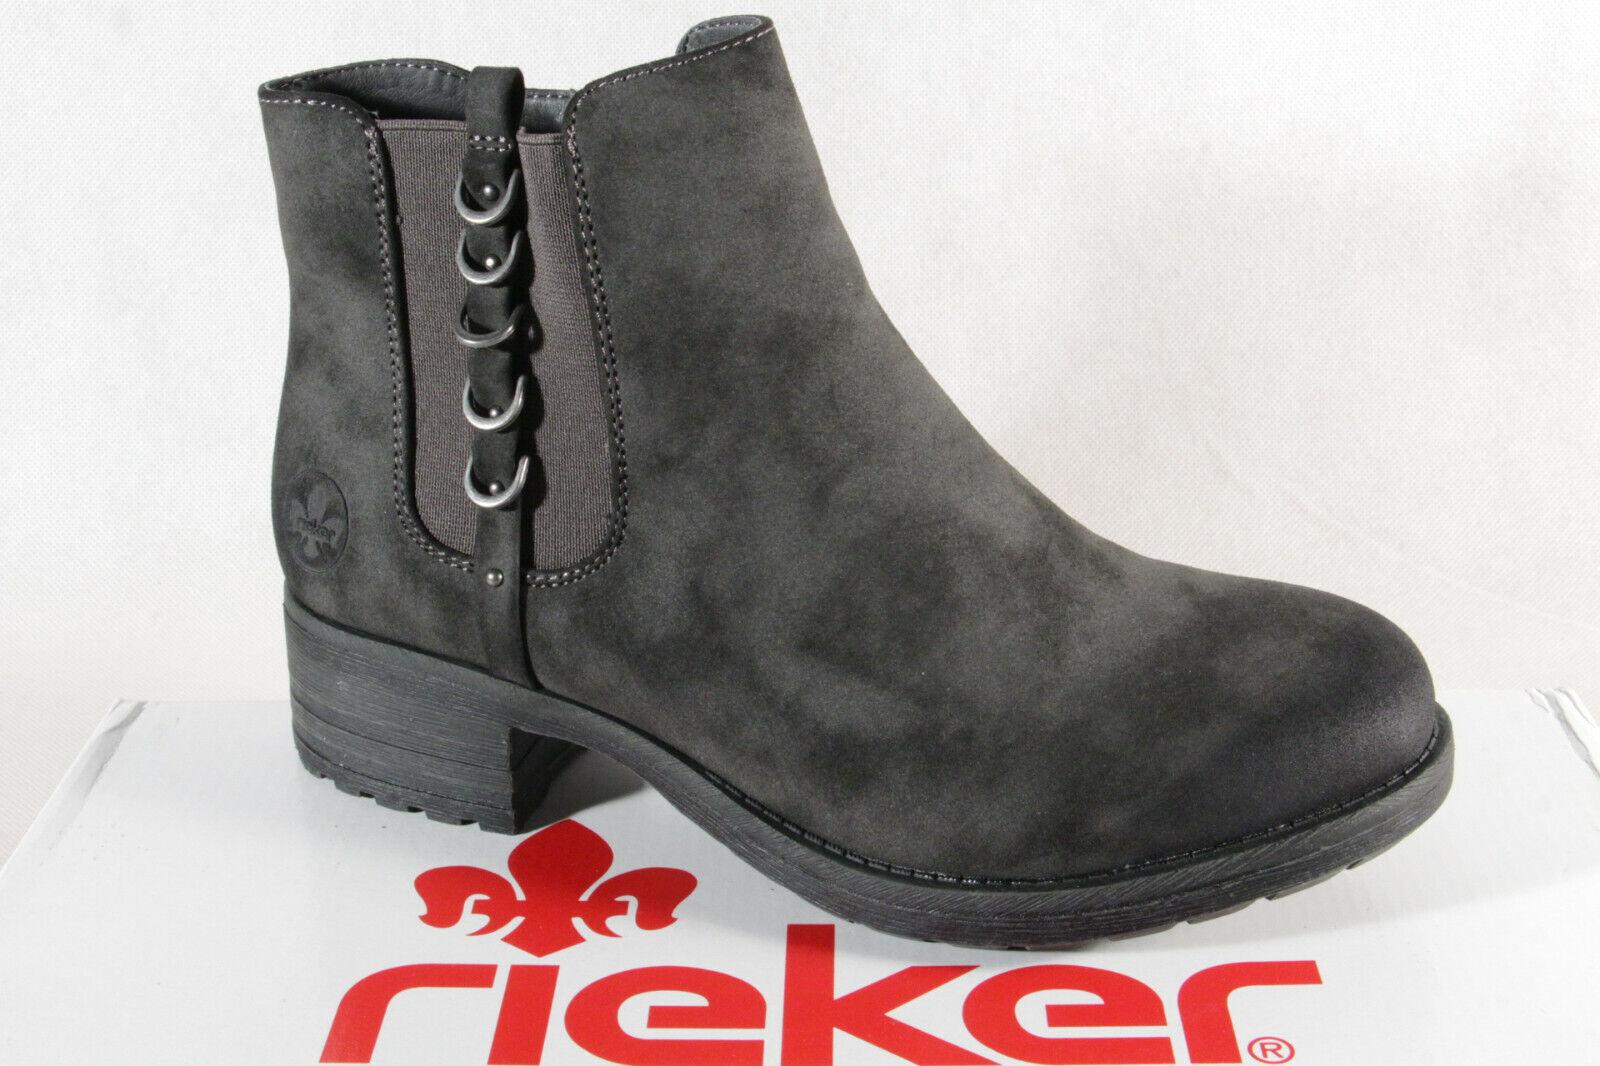 Rieker Stiefel Stiefelette Stiefeletten Boots Winterstiefel grau 96852 NEU!